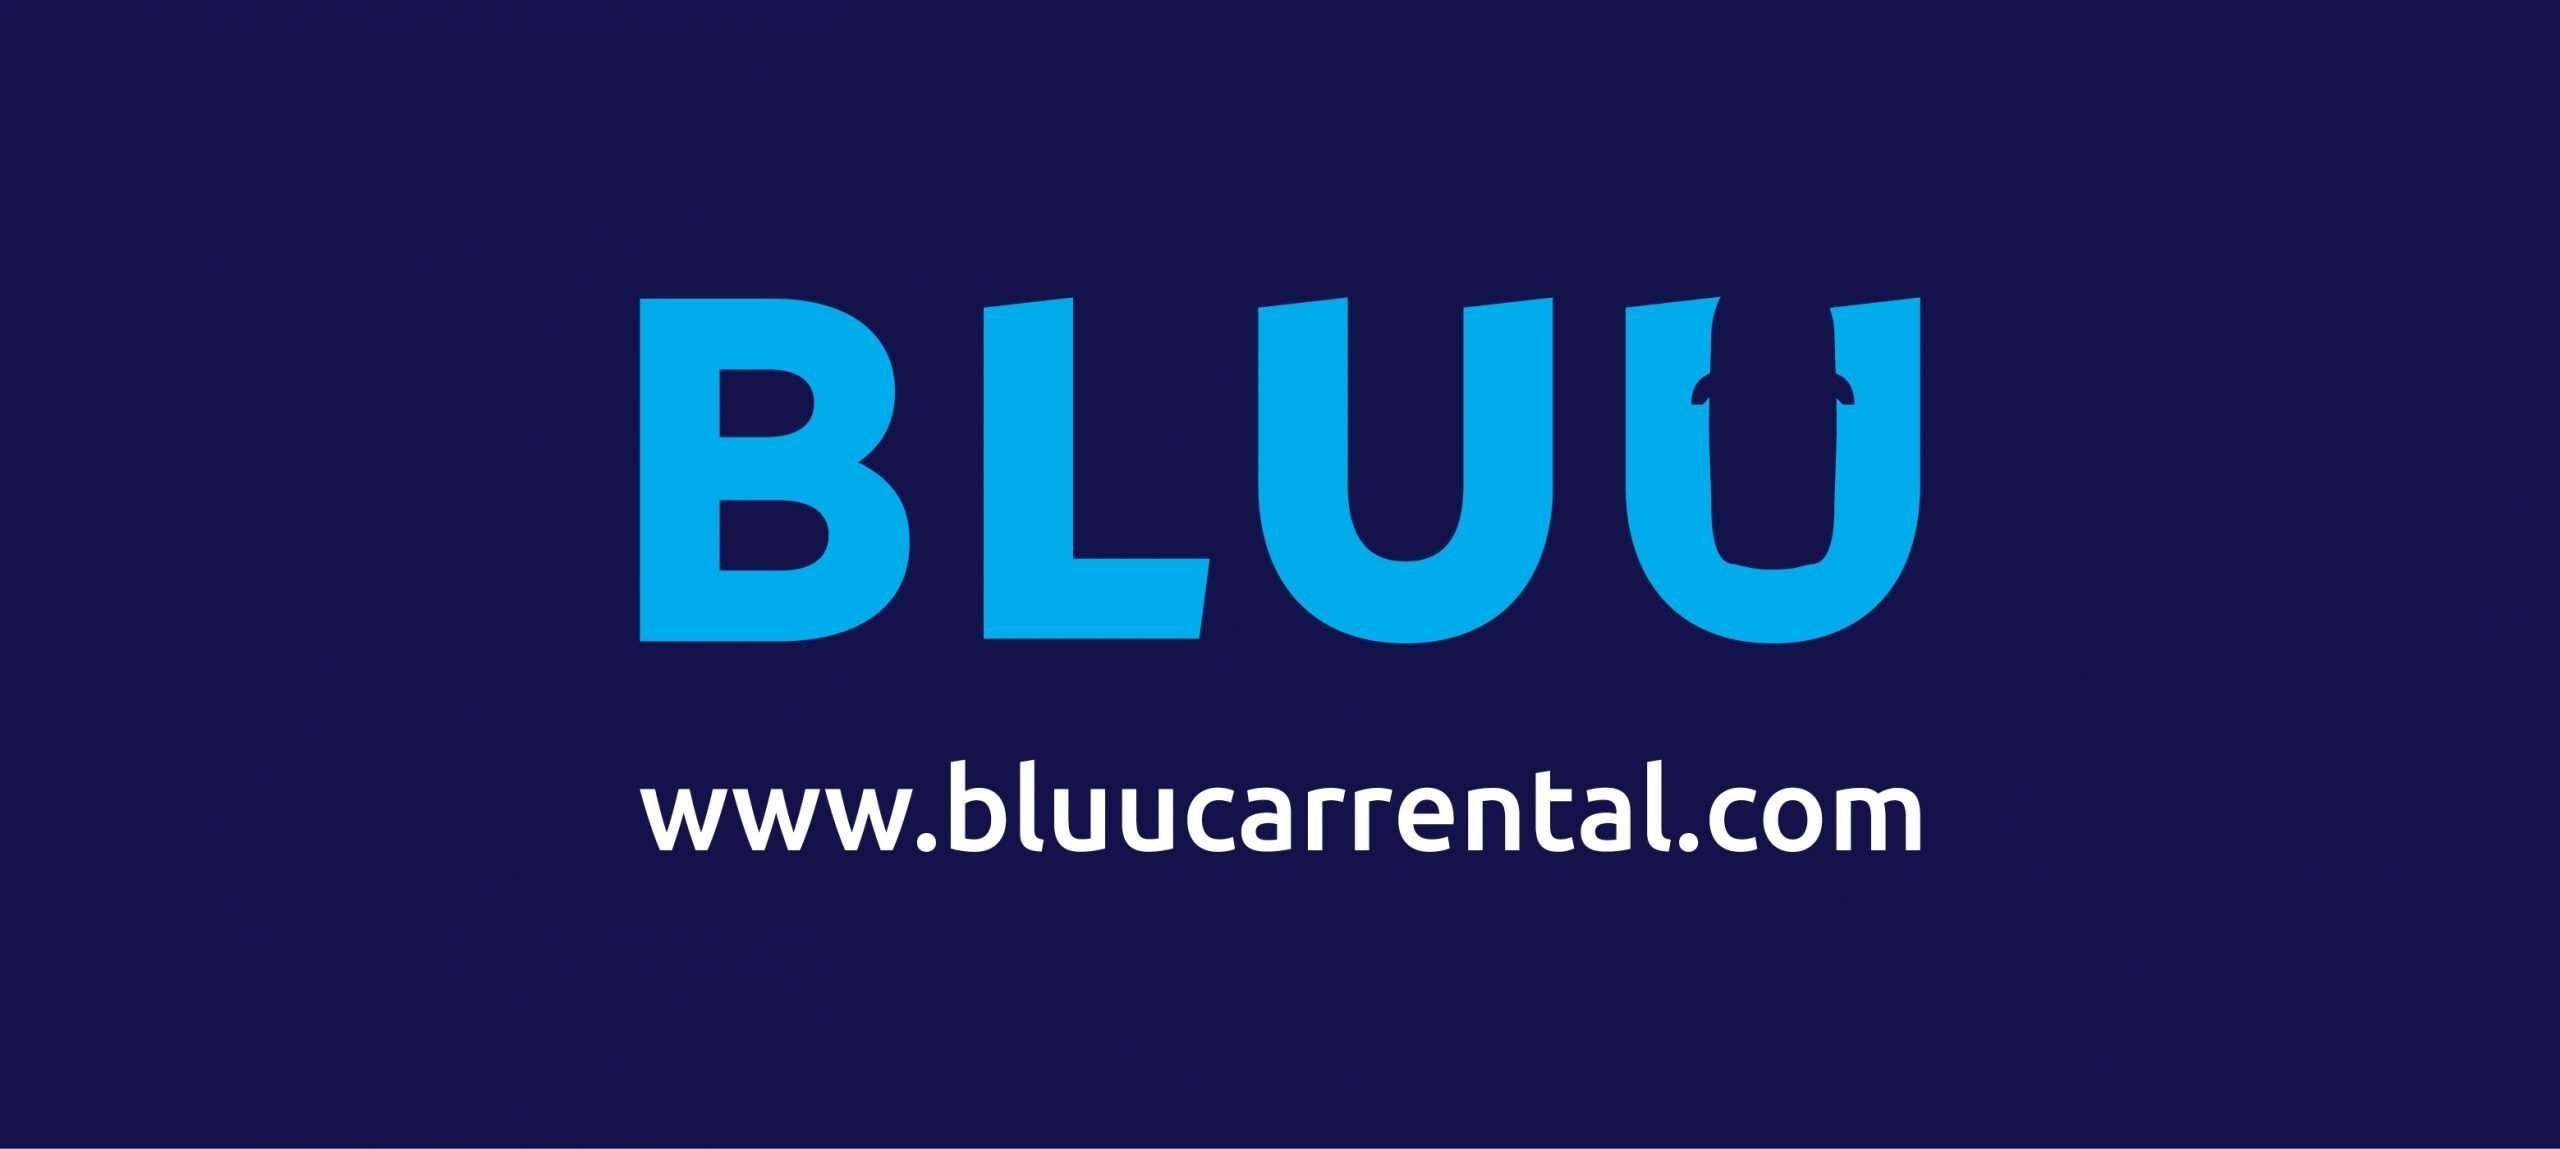 BLUU Car Rental Logo